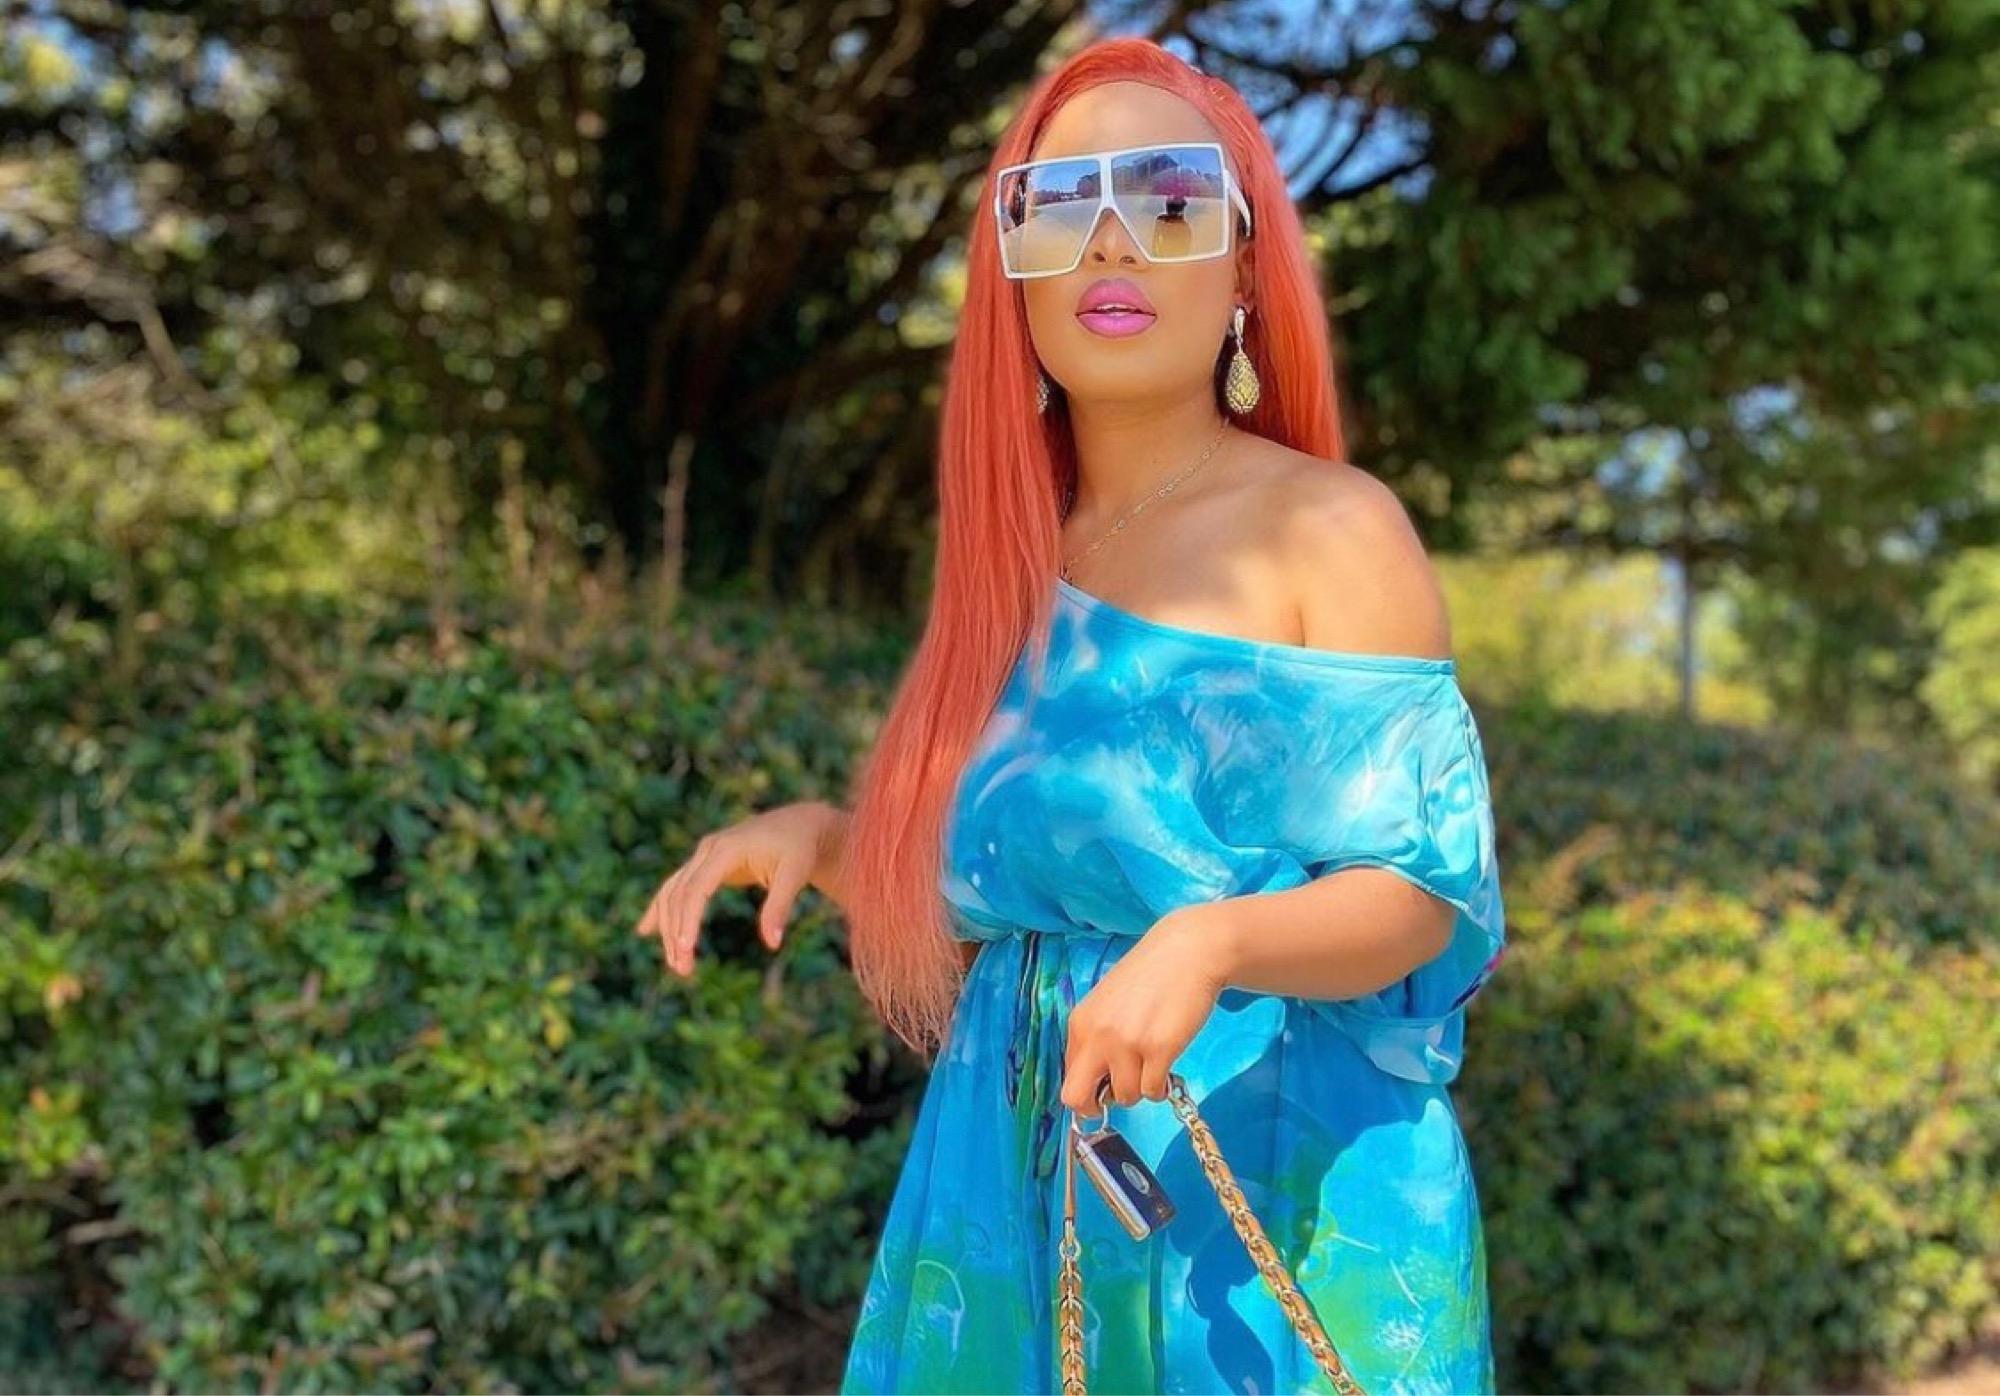 'My Fellow Nigerians, Be Strong' - US Based BBNaija Star, Nina Ivy Says